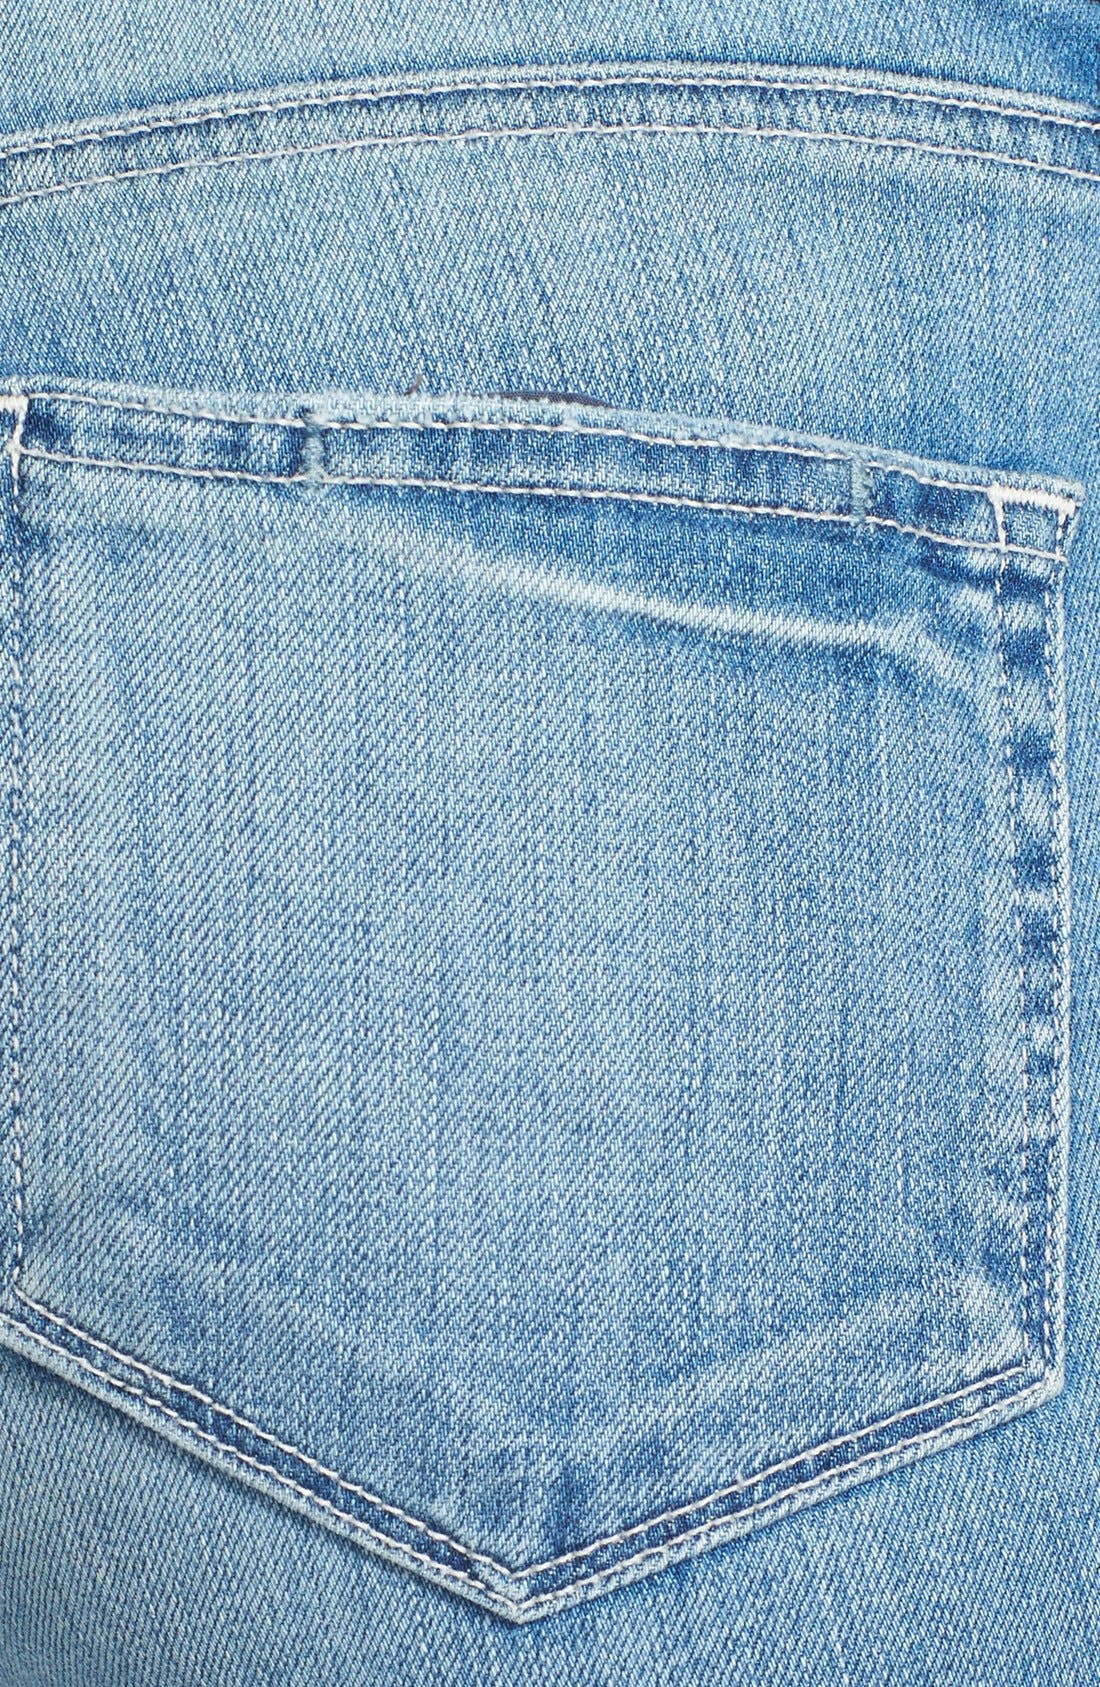 Alternate Image 3  - Paige Denim 'Skyline' Ankle Peg Skinny Jeans (Whitley)